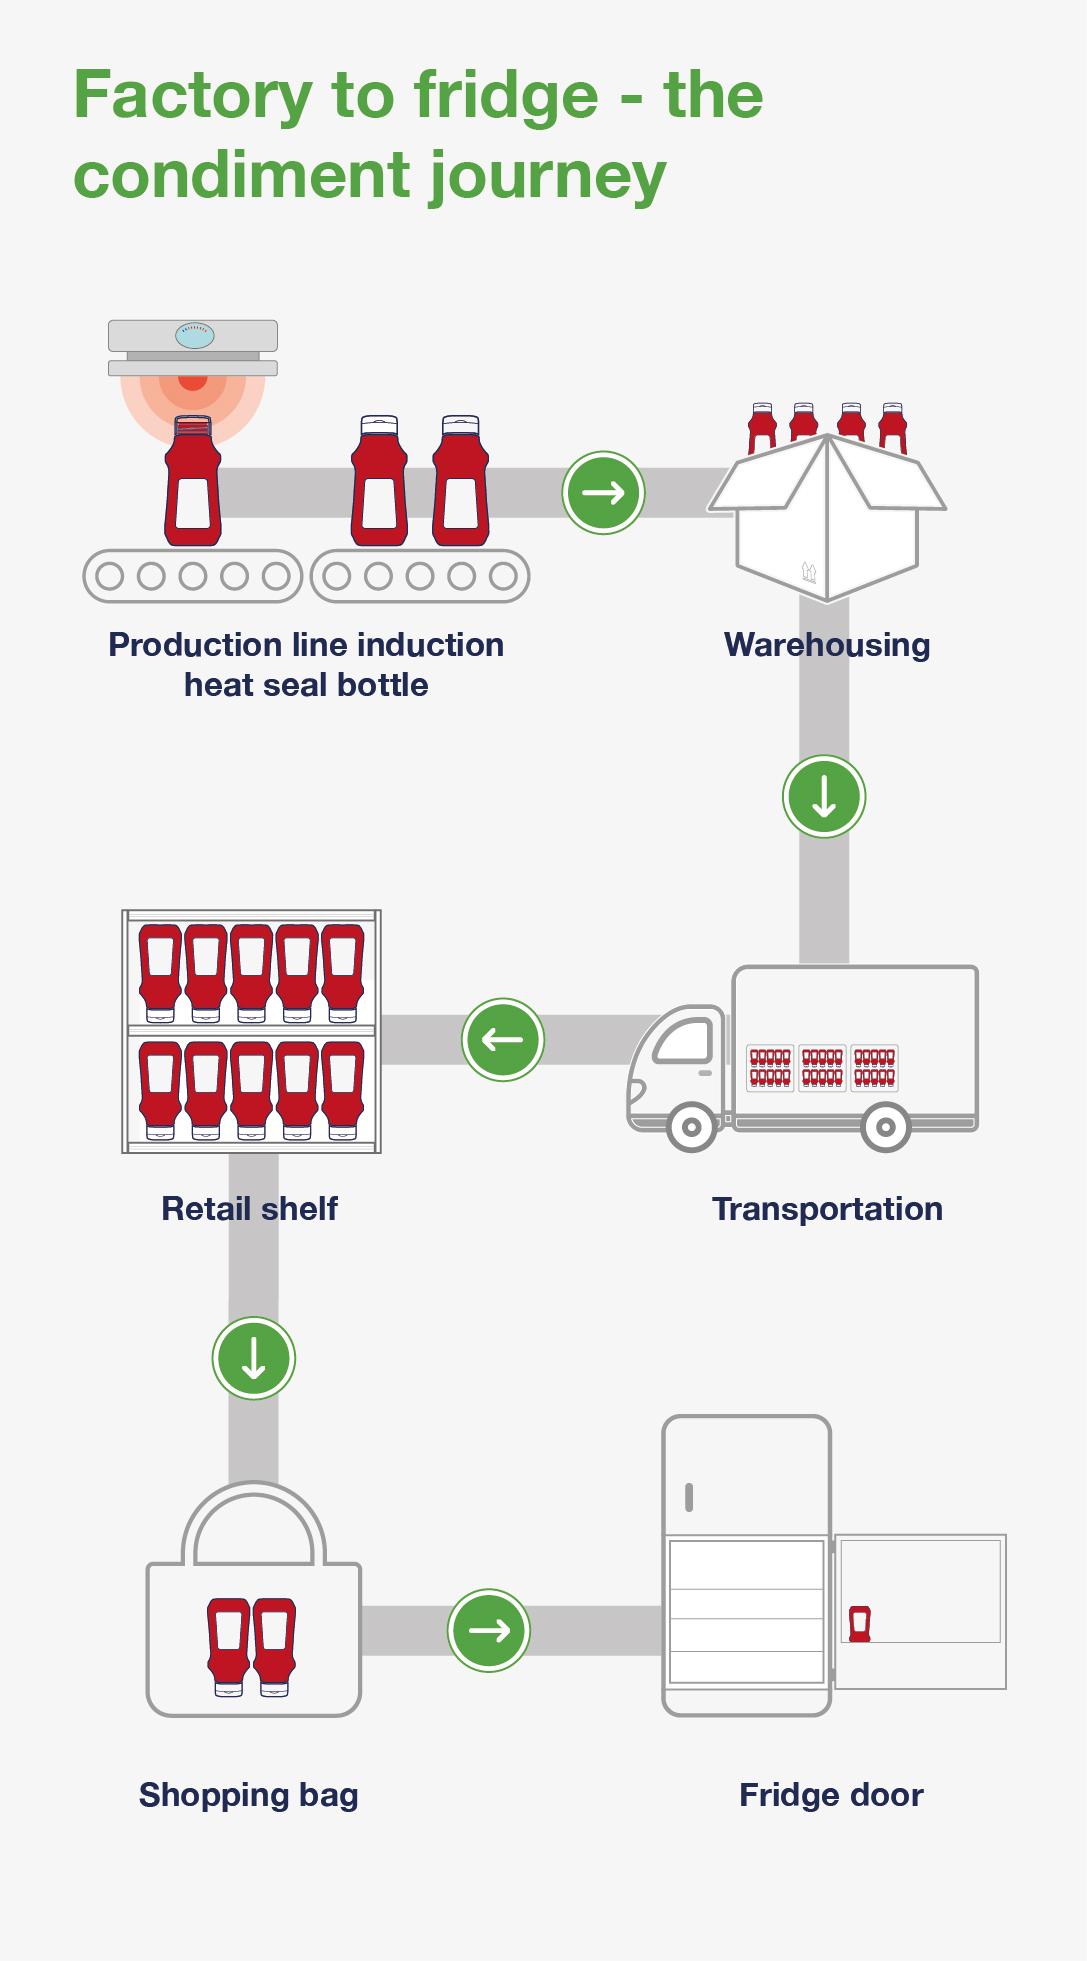 Factory to Fridge - The Condiment Journey